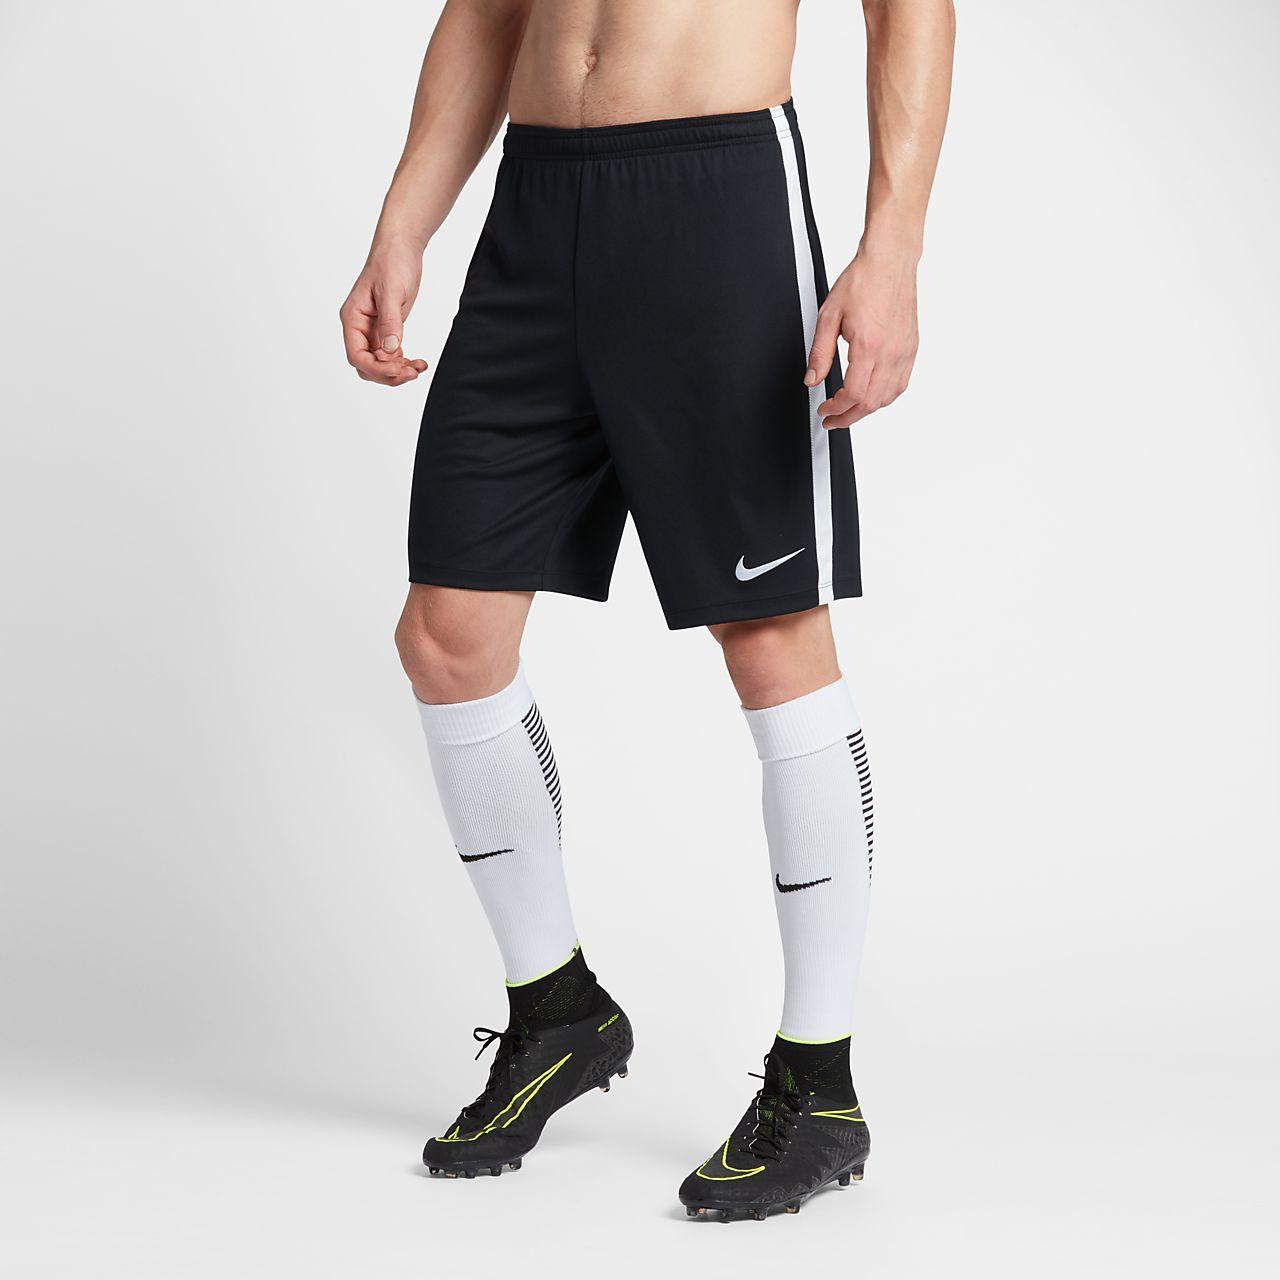 ... Nike Dri-FIT Academy Men's Football Shorts